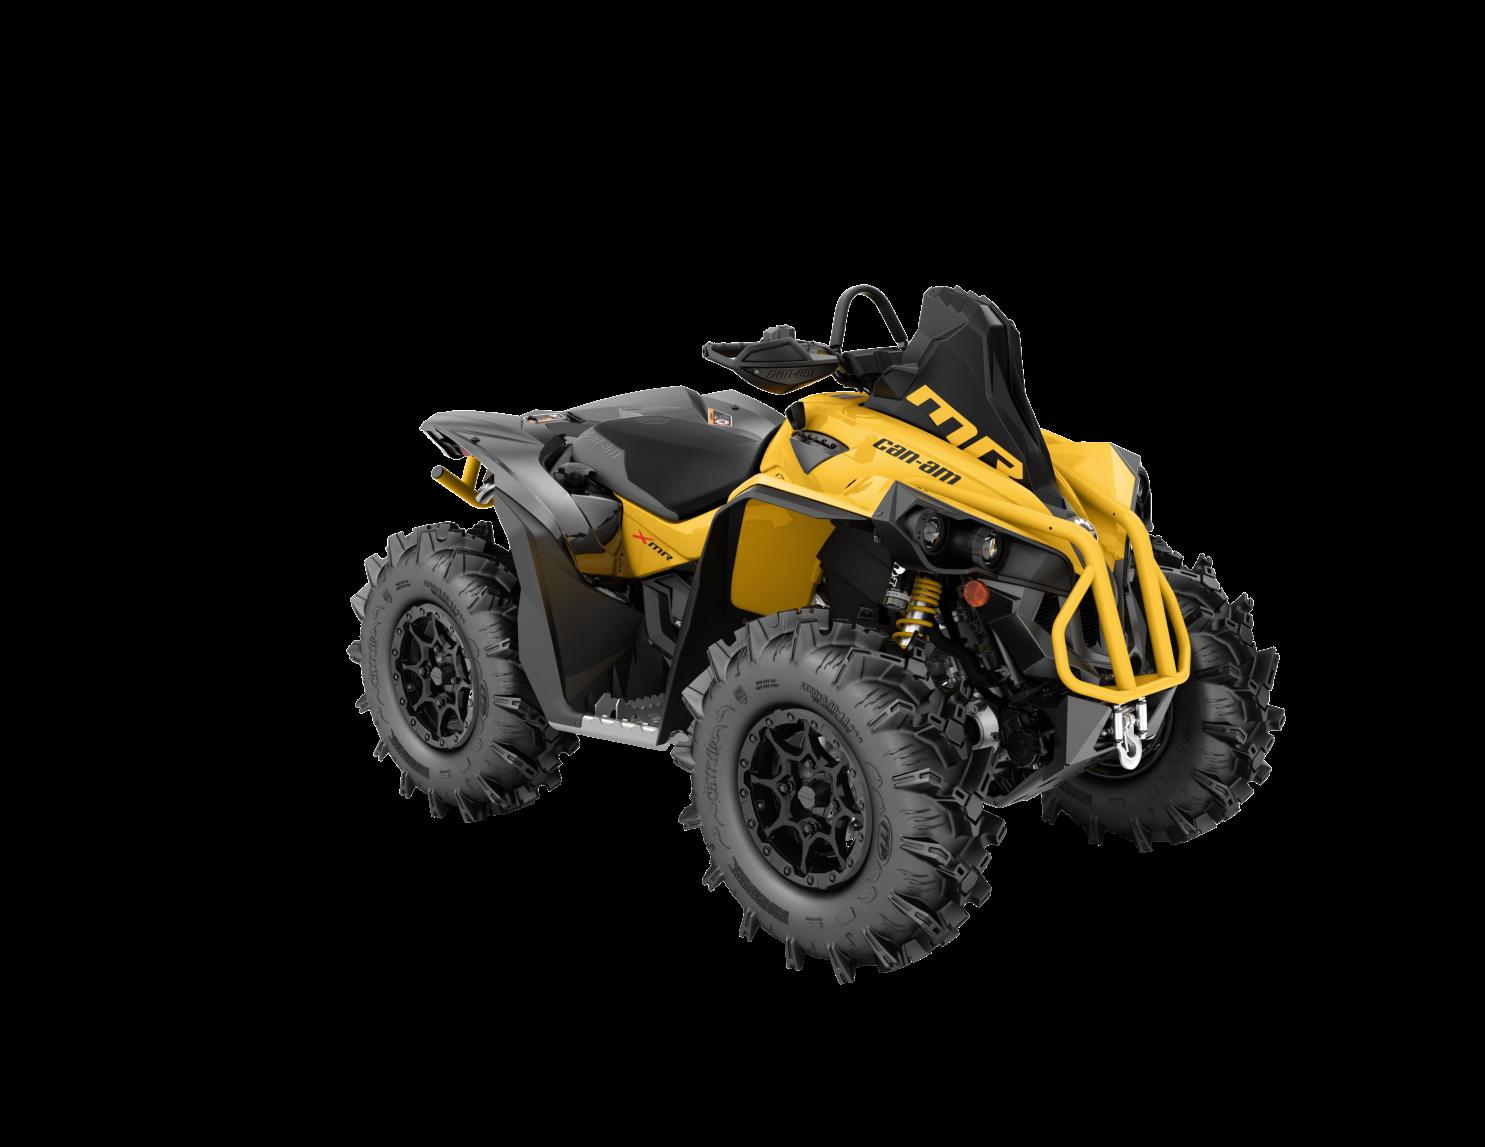 Renegade 1000R X MR